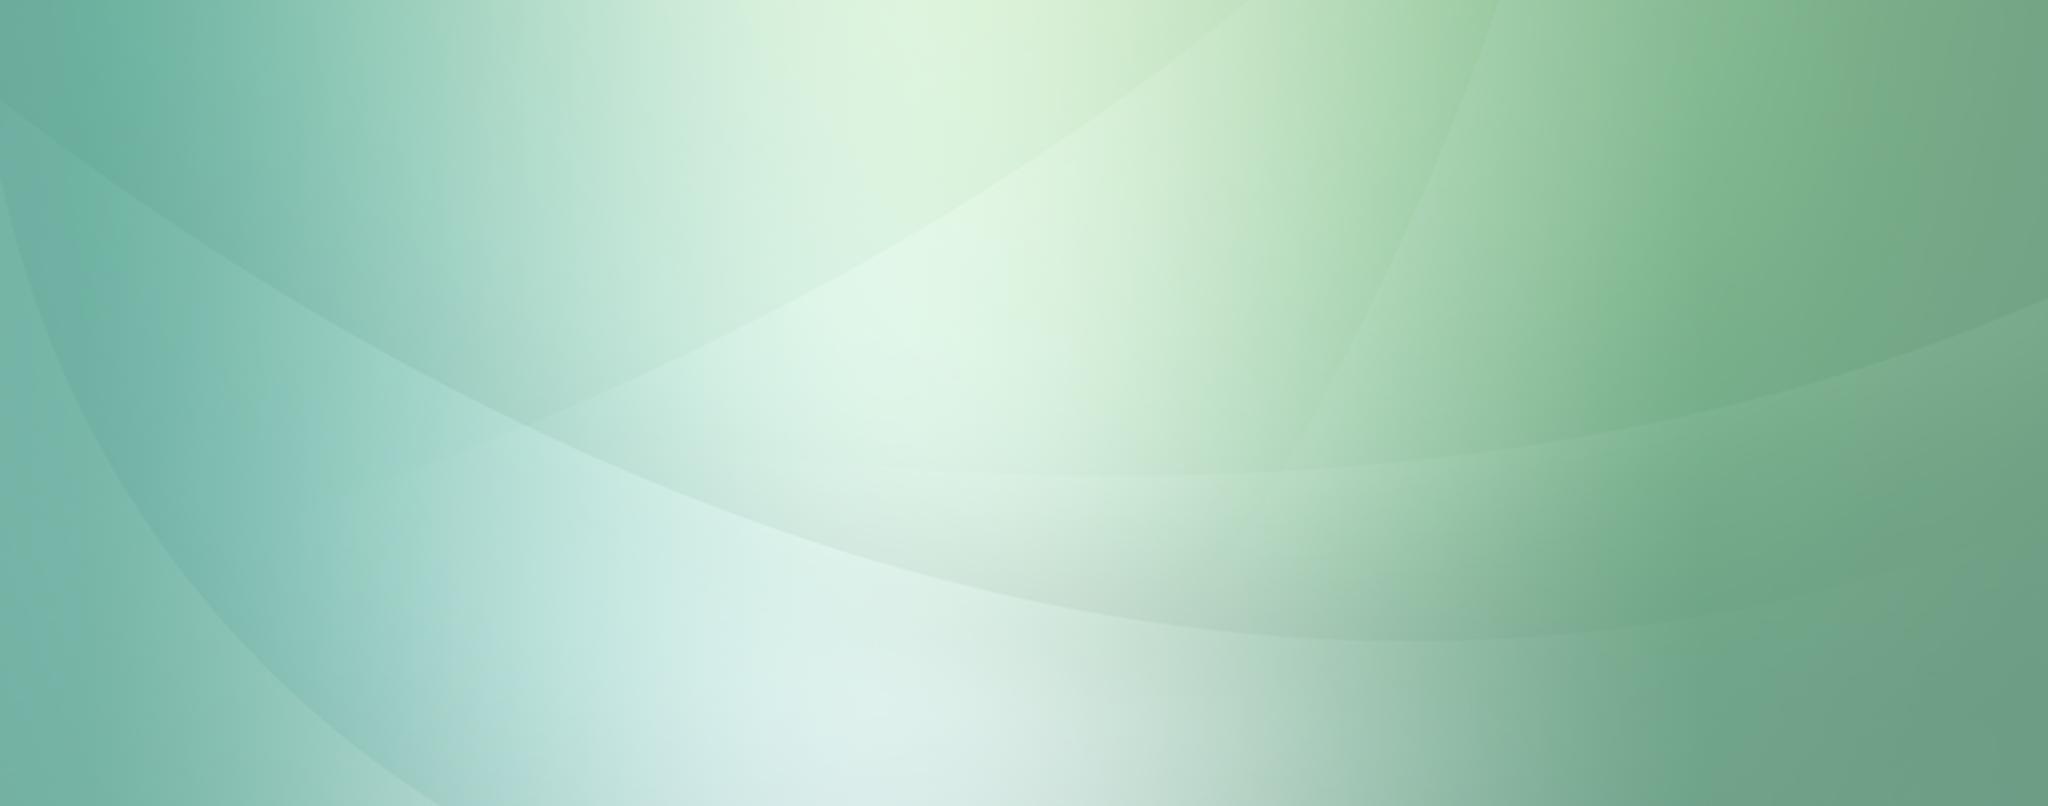 summitbknd-green